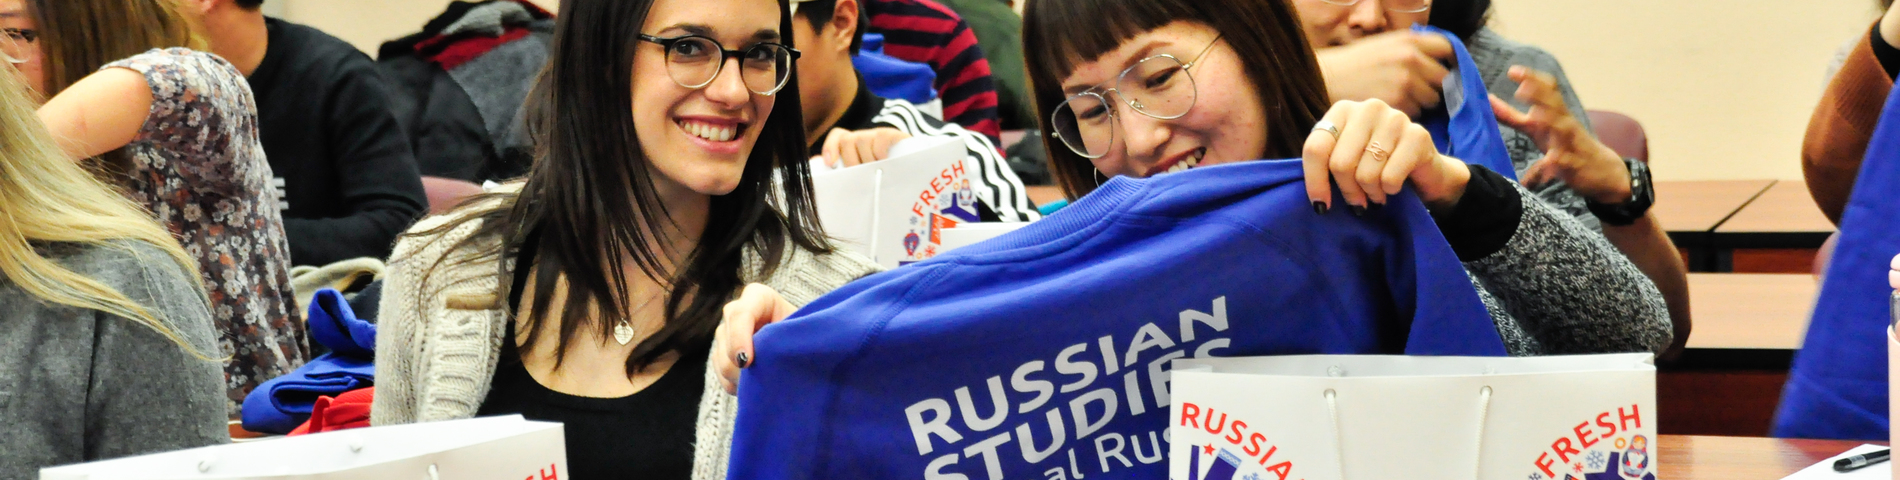 Russian Studies in Real Russia afbeelding 1